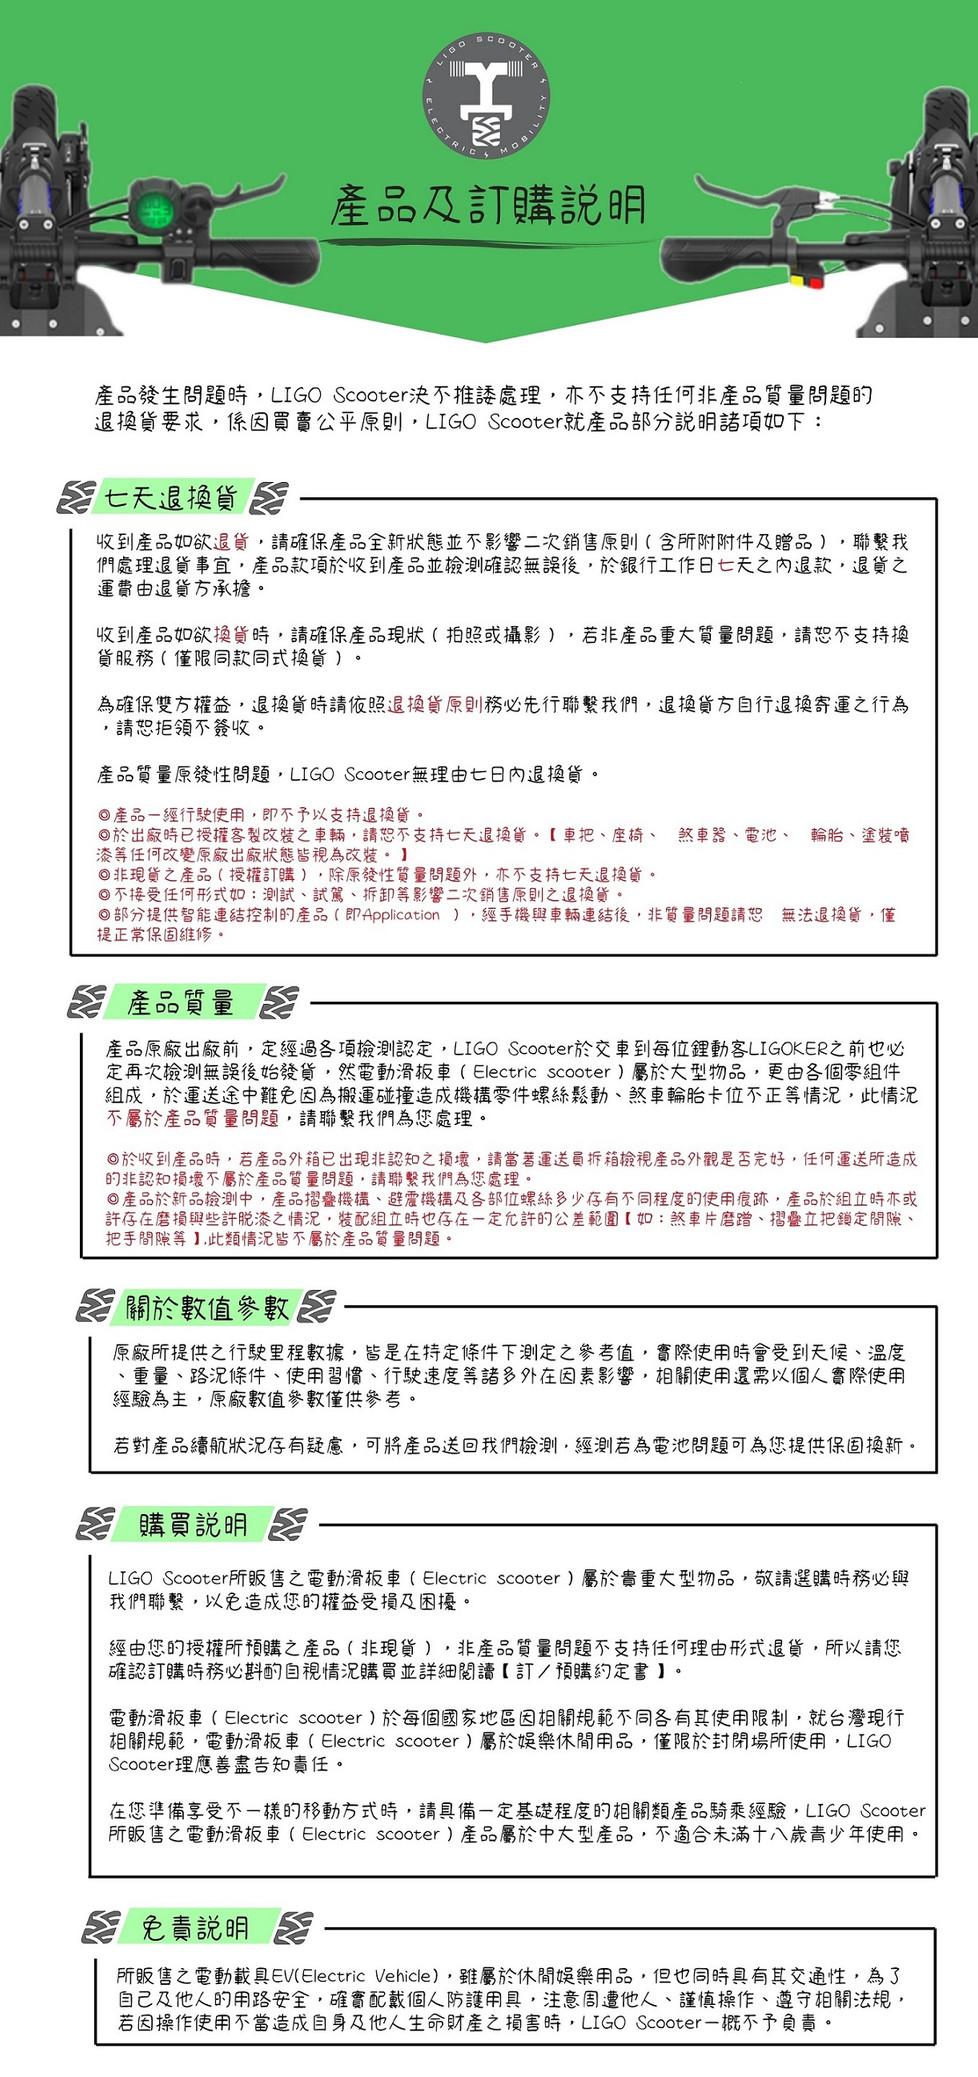 LIGO產品及訂購說明_七天退貨_購買說明_電動滑板車-200816.jpg